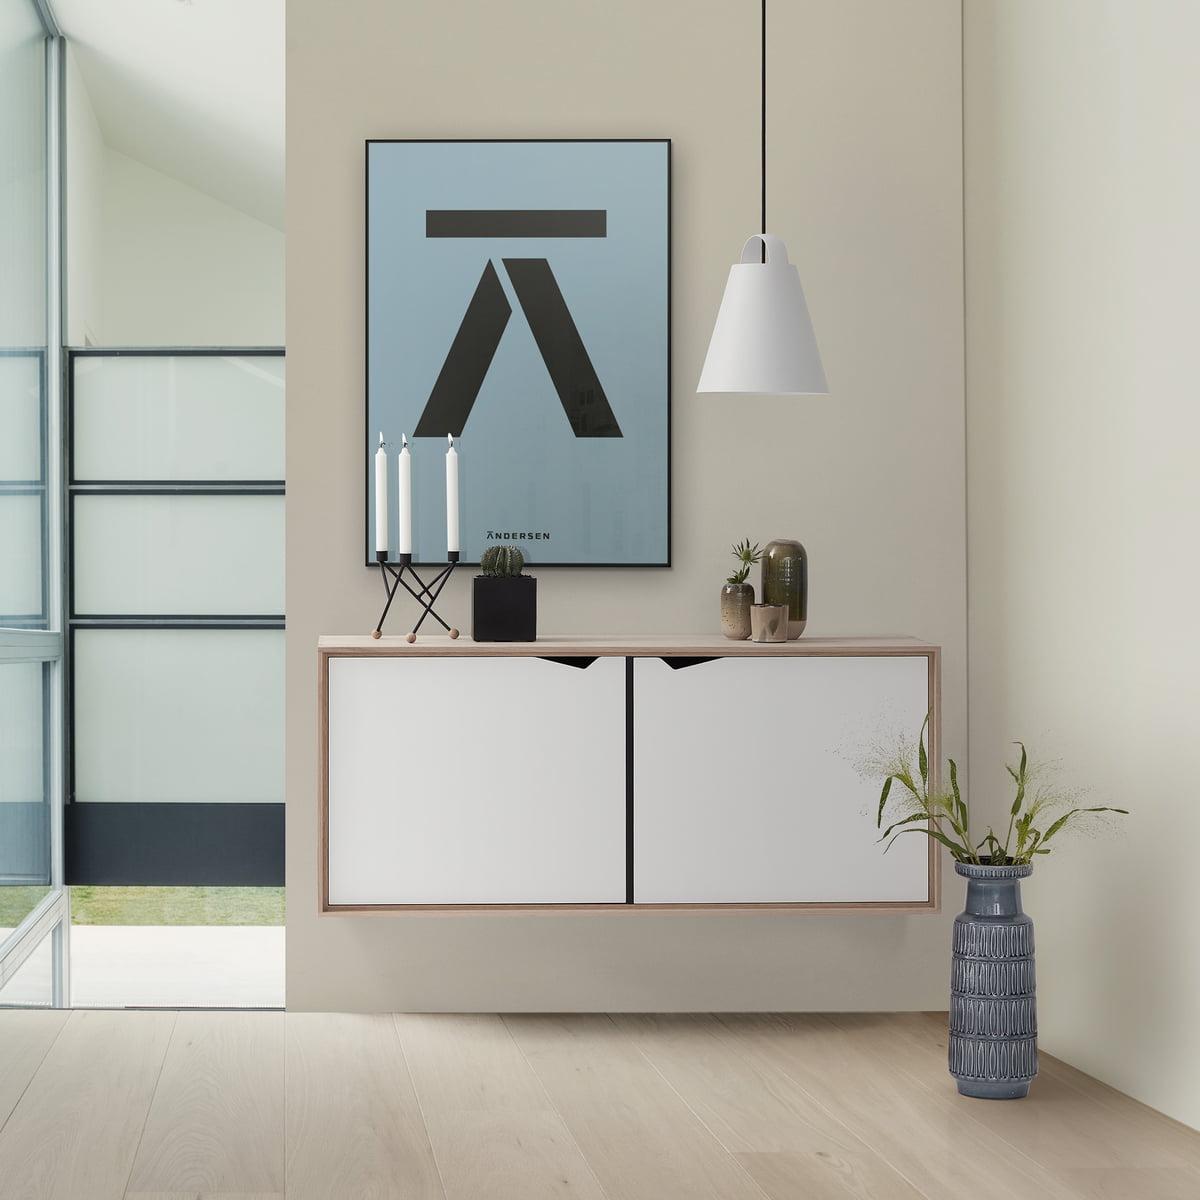 module furniture. Andersen Furniture - S2 Hanging Module With 2 Doors, Soaped Oak / White Laminate O